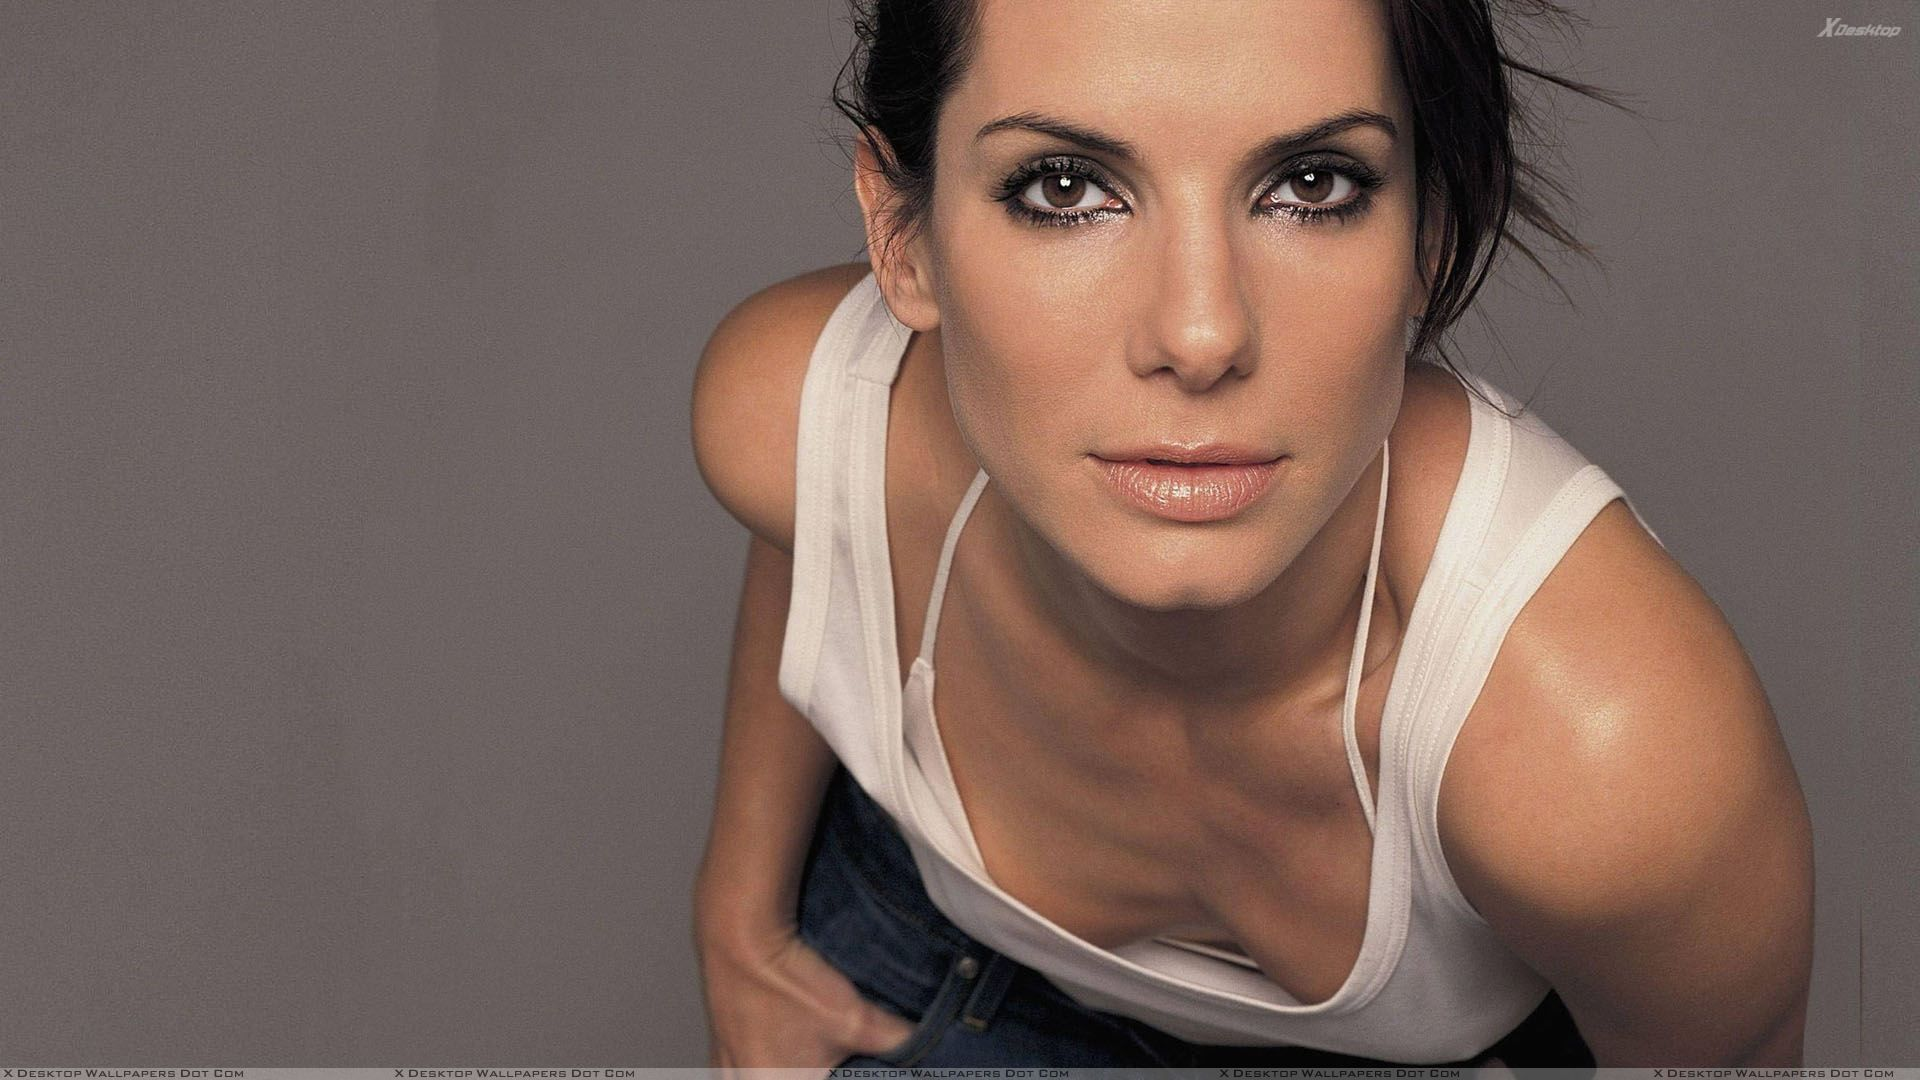 Sandra Bullock Exclusives Unseen Picture | Kickass Ladies ...